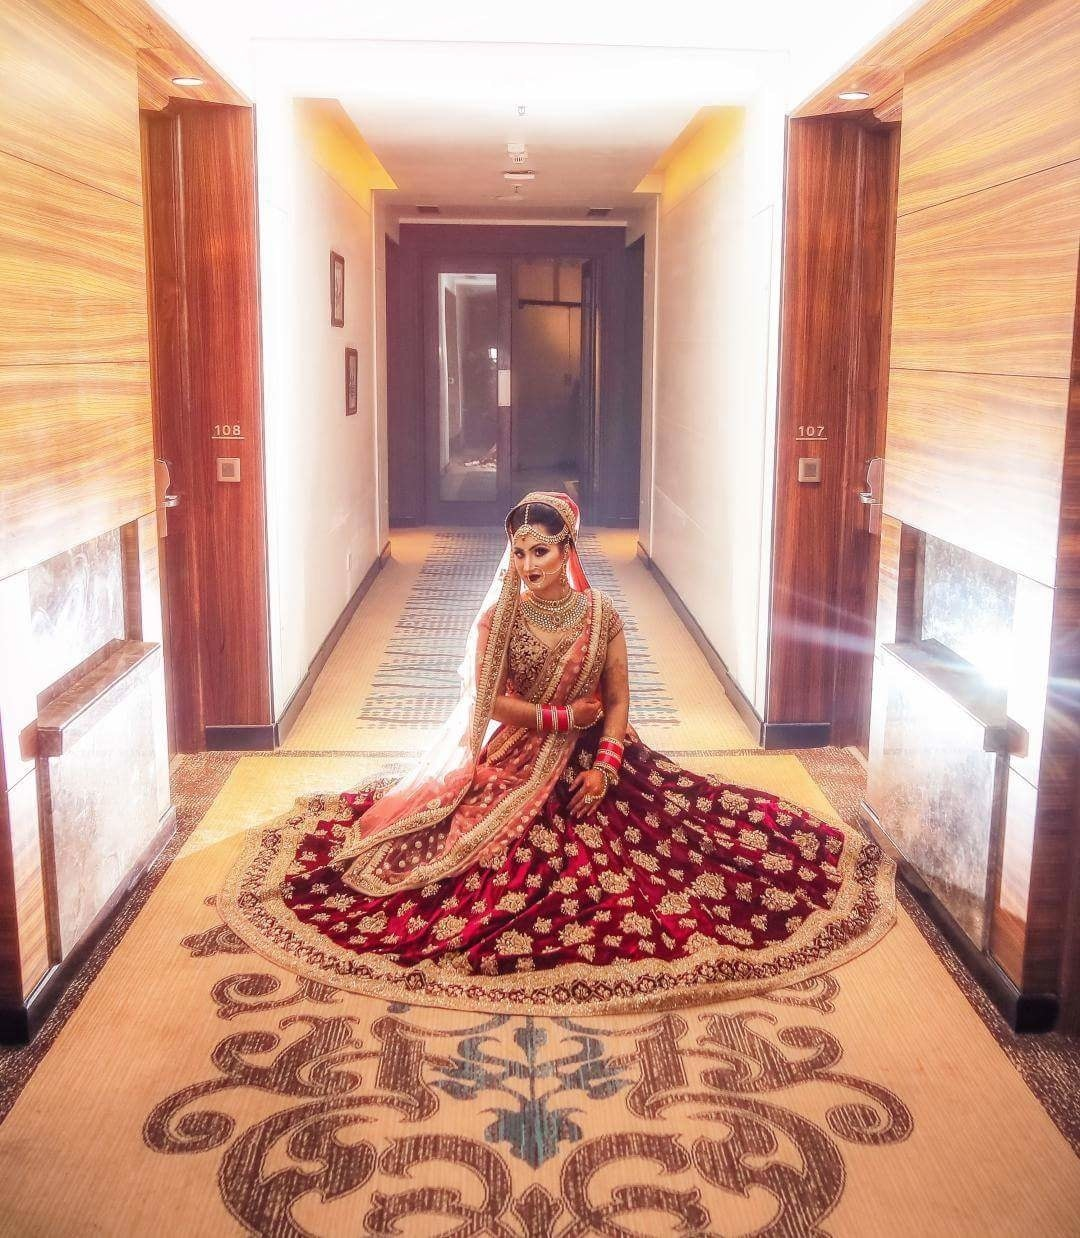 A must-have shot of your designer lehenga!  Shop your style at WedLista.com- India's Premier 'Fashion for Weddings' Online Destination!  #WedLista #FashionForWeddings